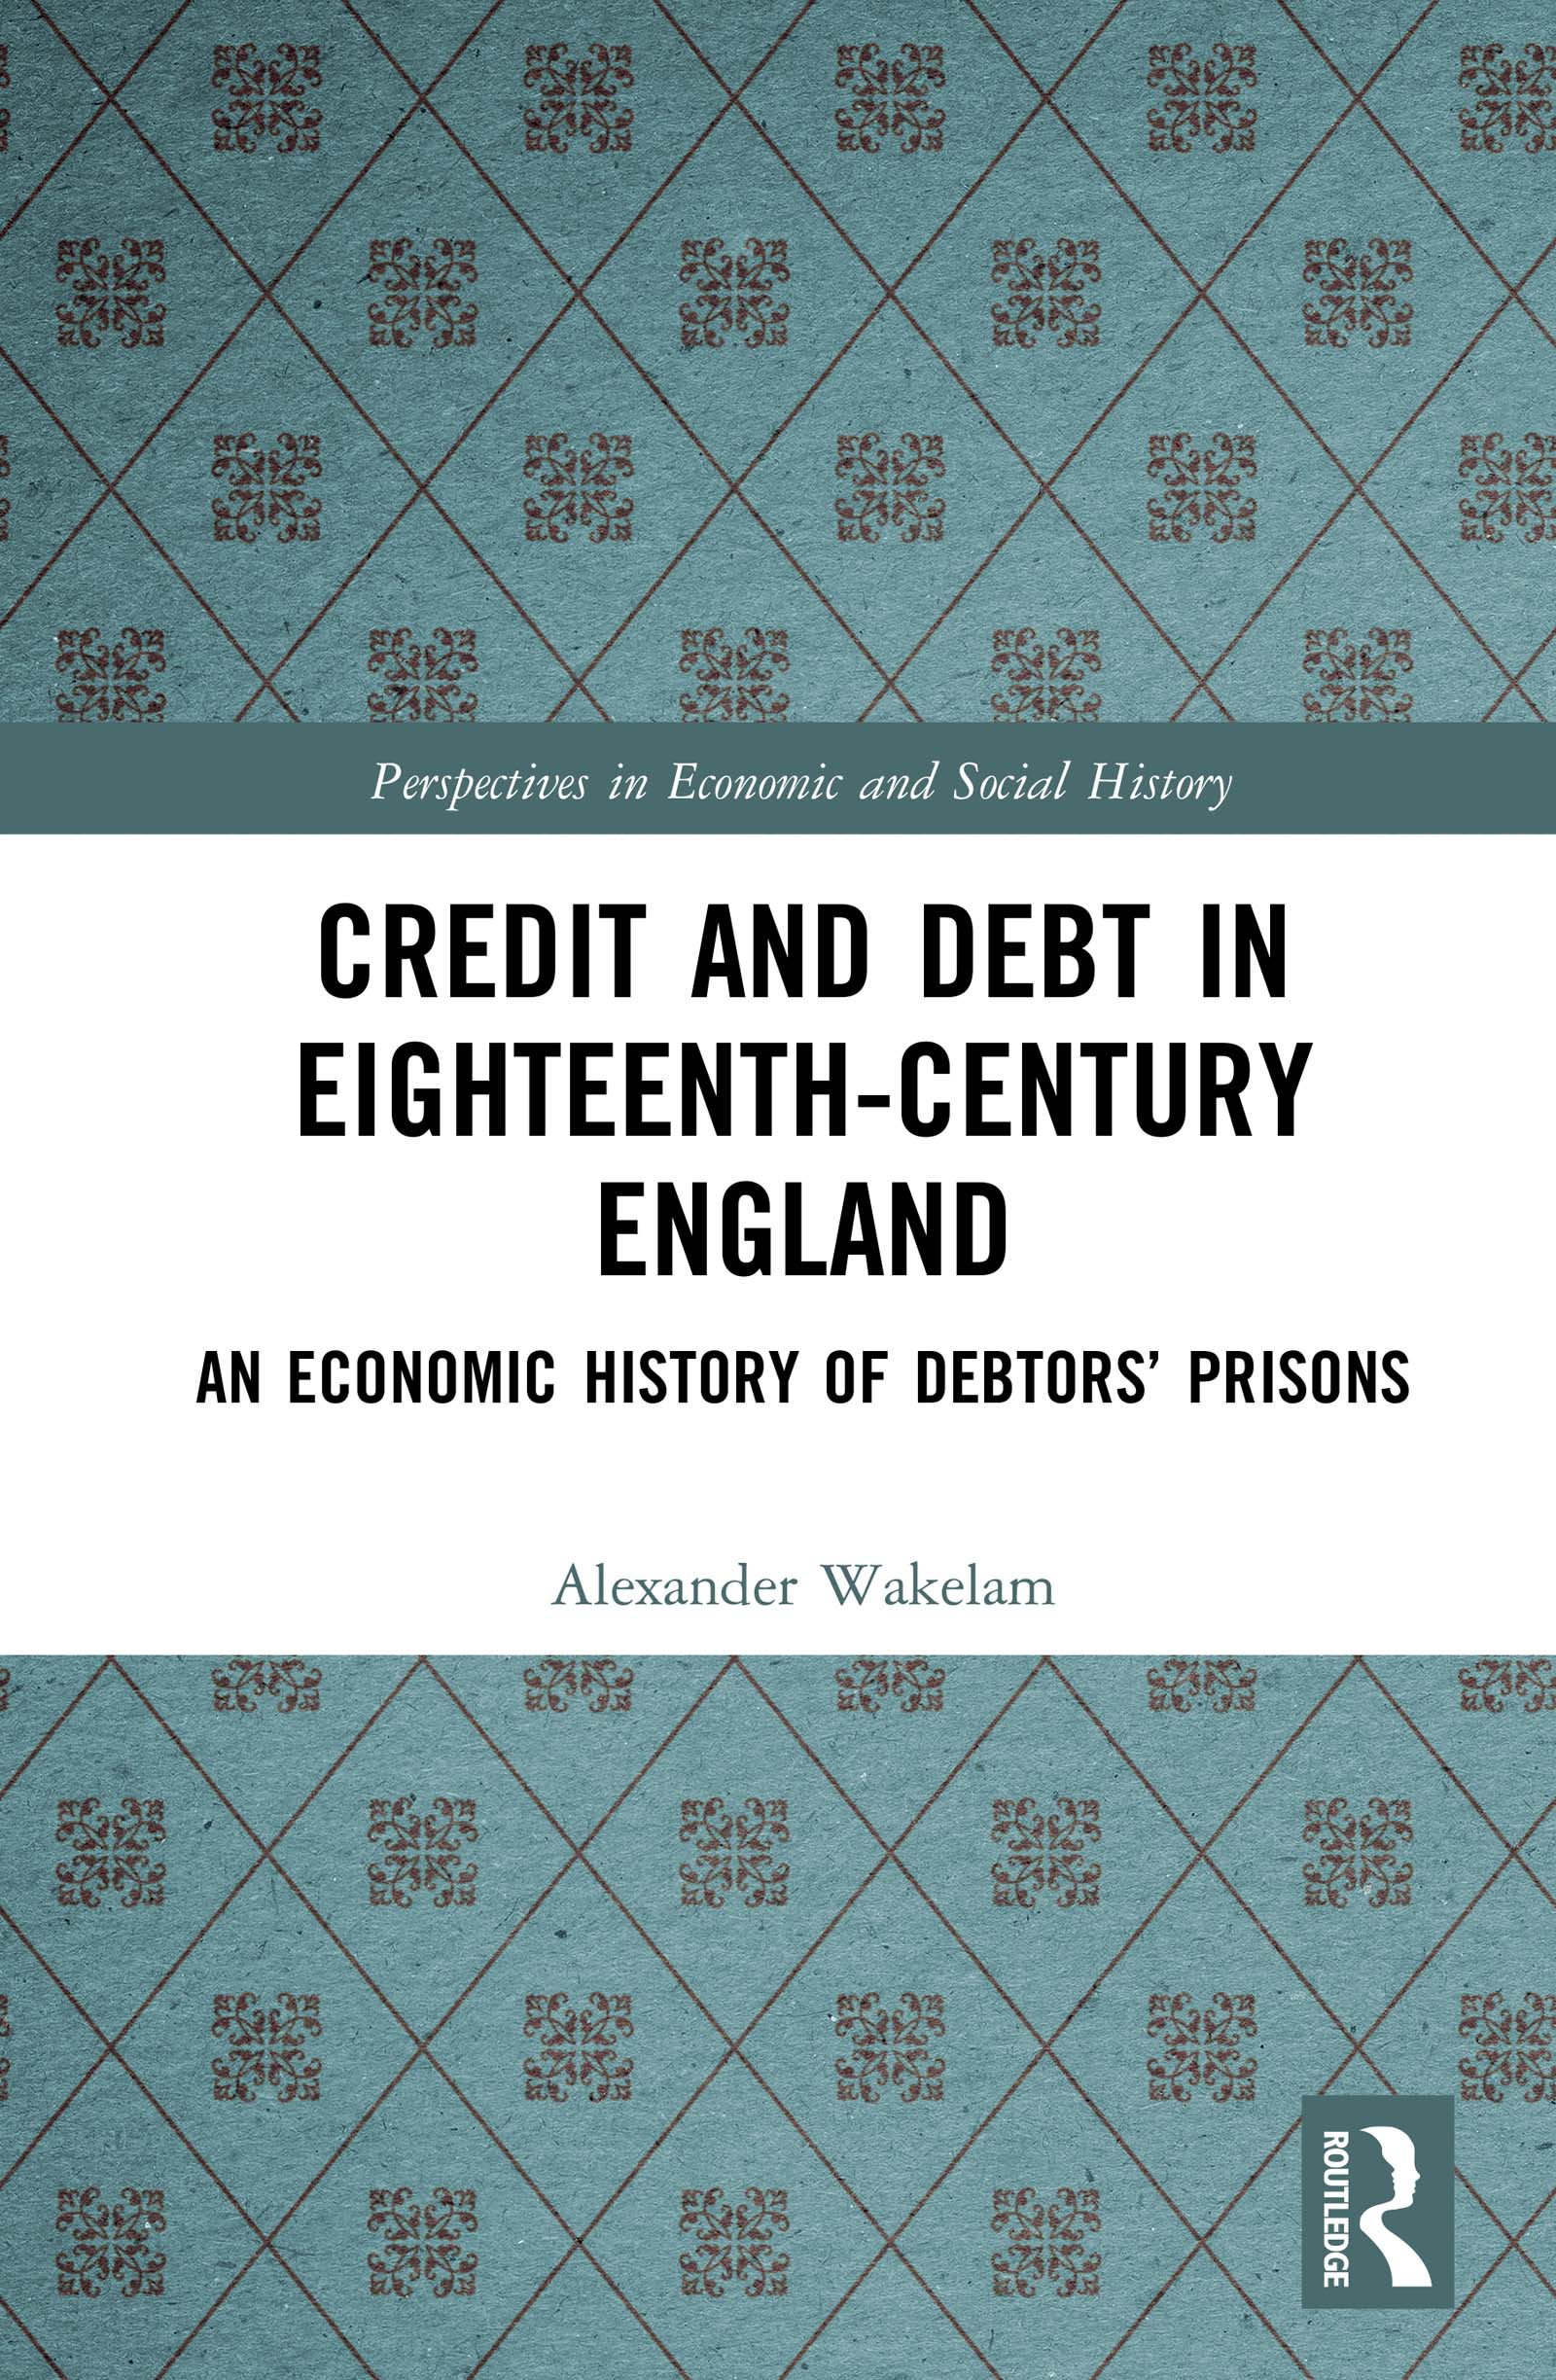 Credit and Debt in Eighteenth-Century England